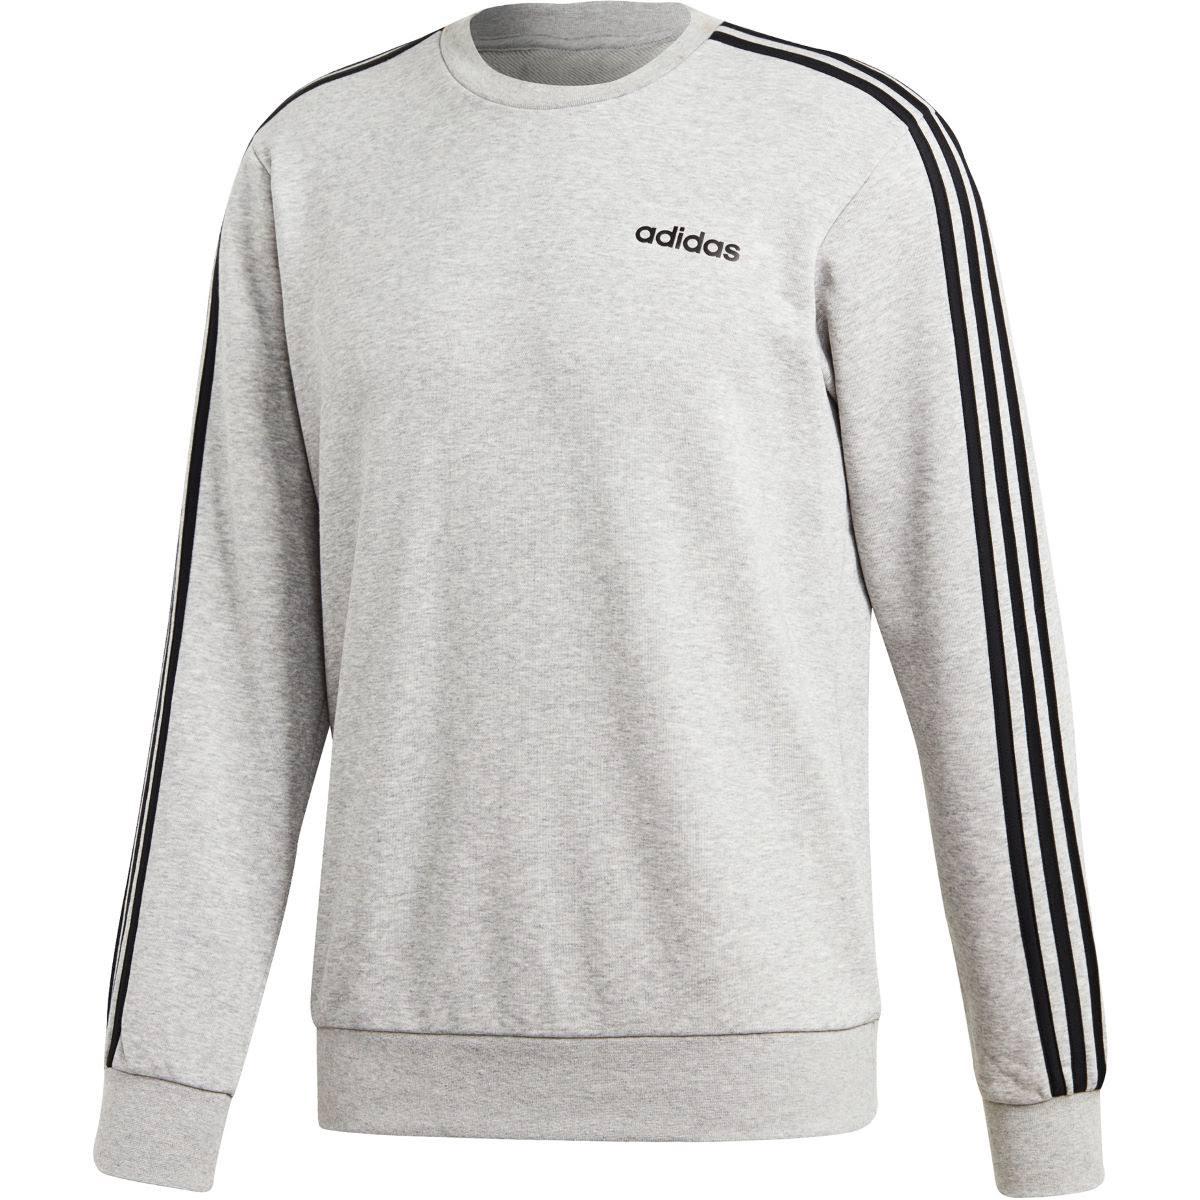 Adidas Essentials 3-Stripes Sweatshirt - Grey - Men